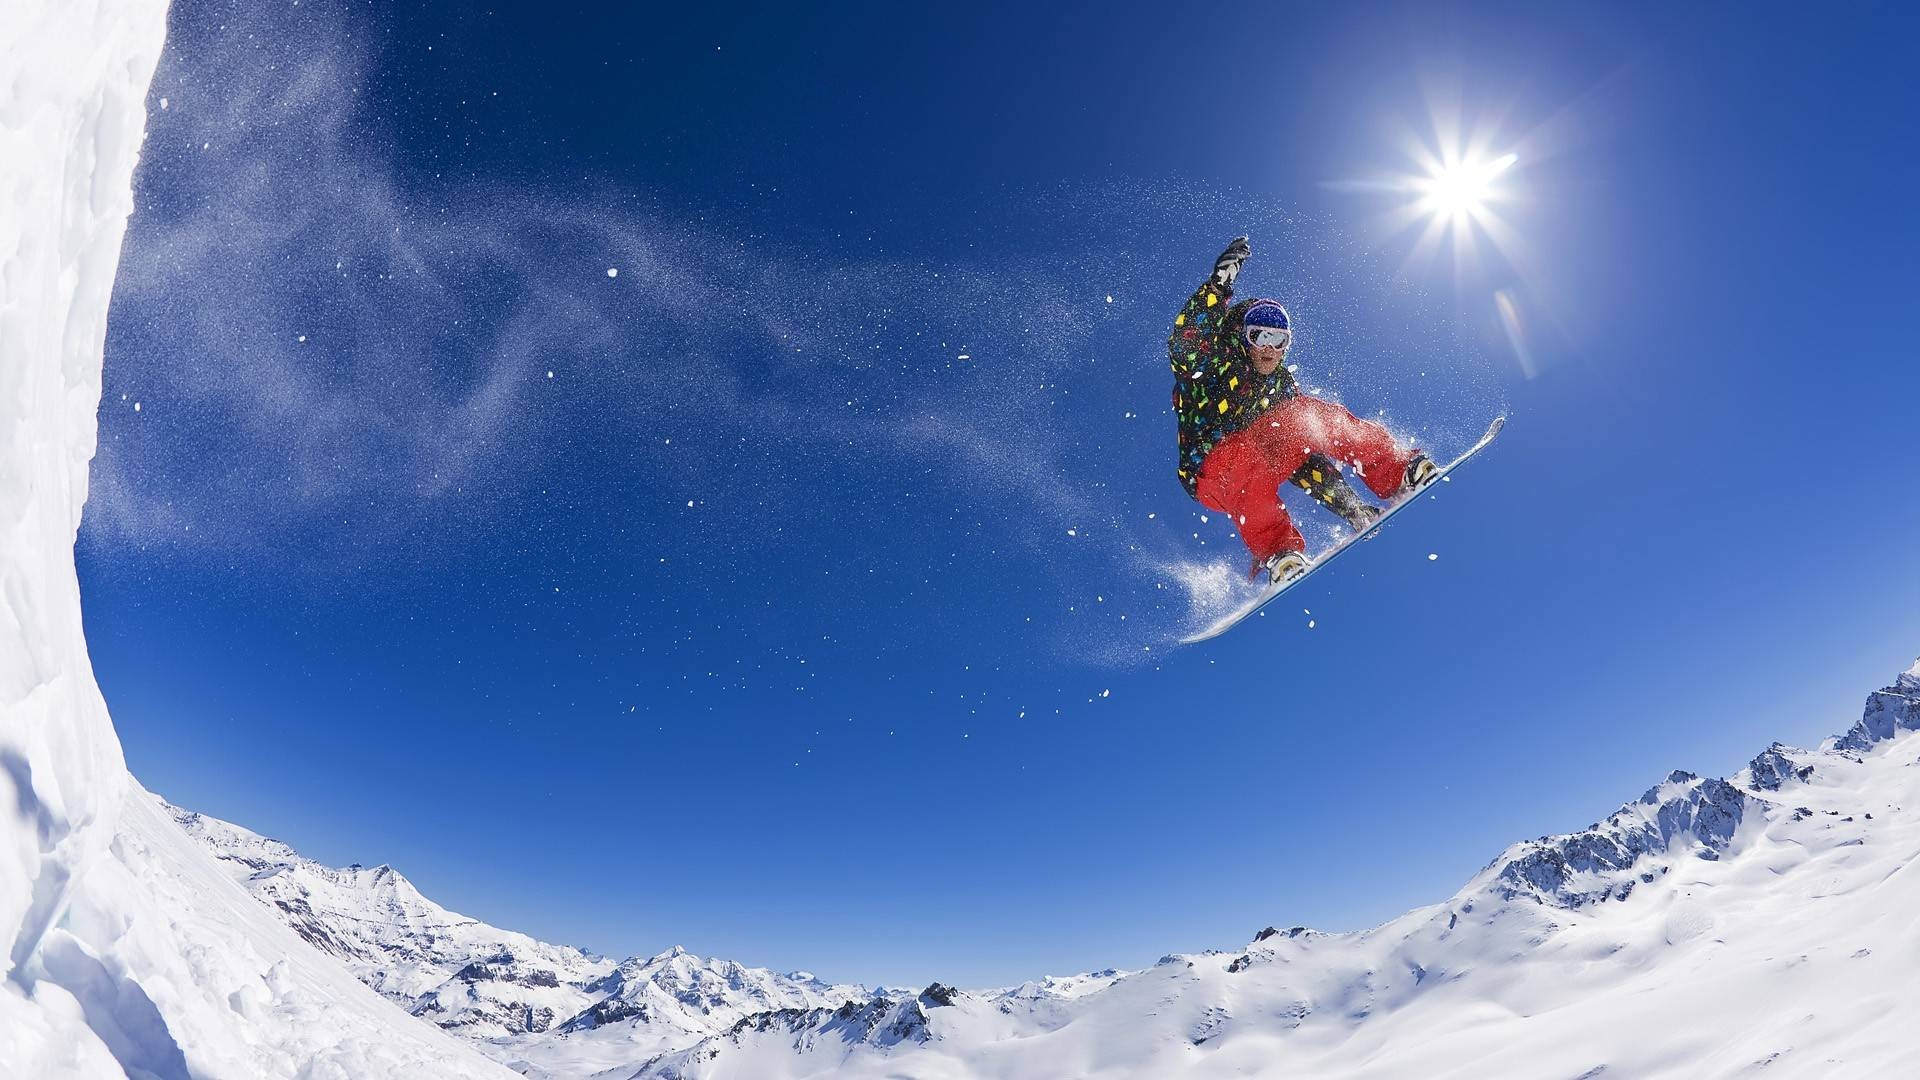 snowboarding-action-shot-wallpaper-1920x1080.jpg